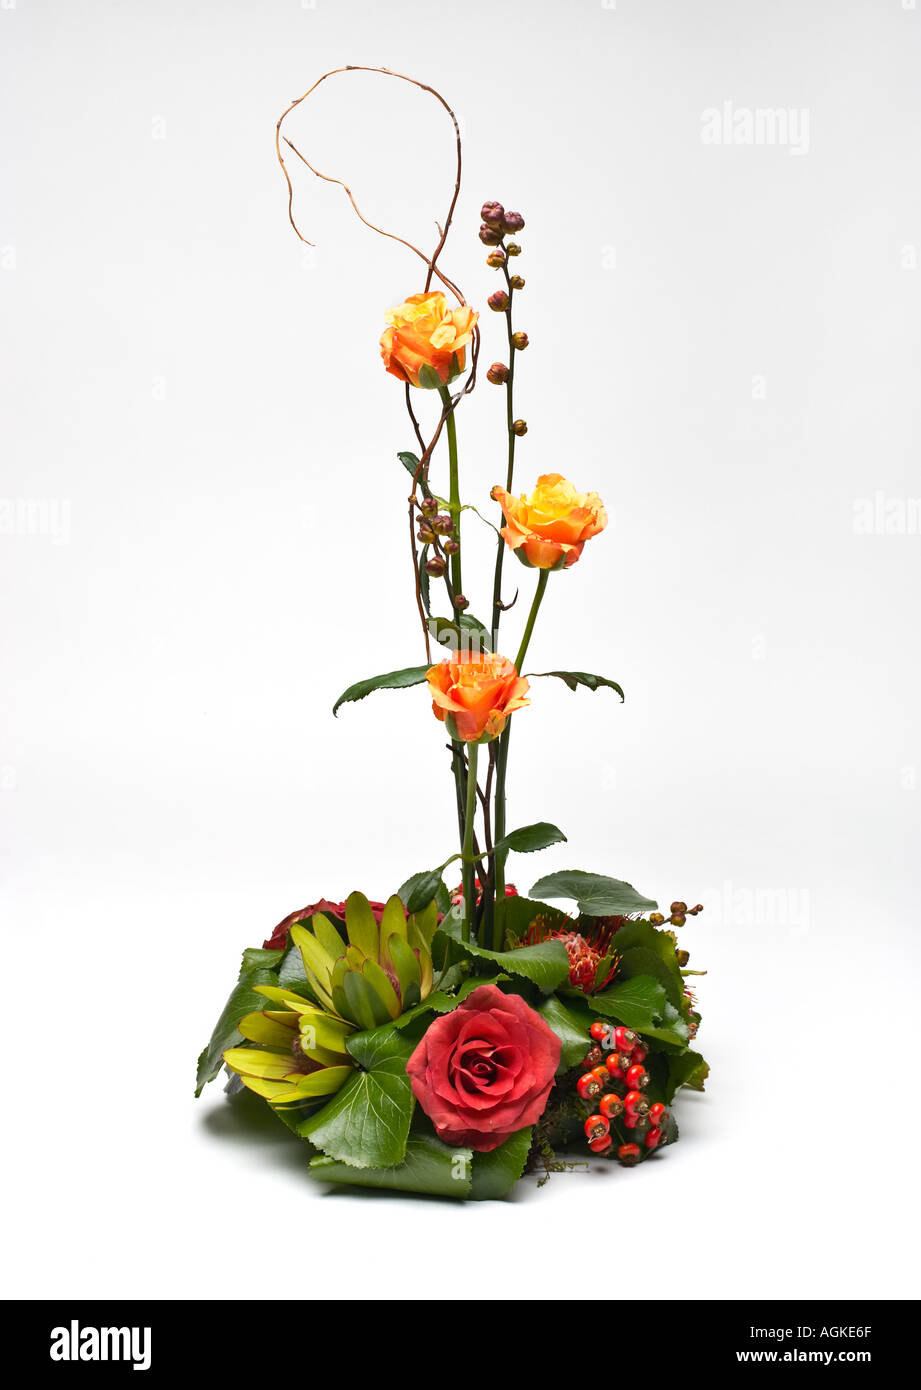 Wedding table decoration - Stock Image